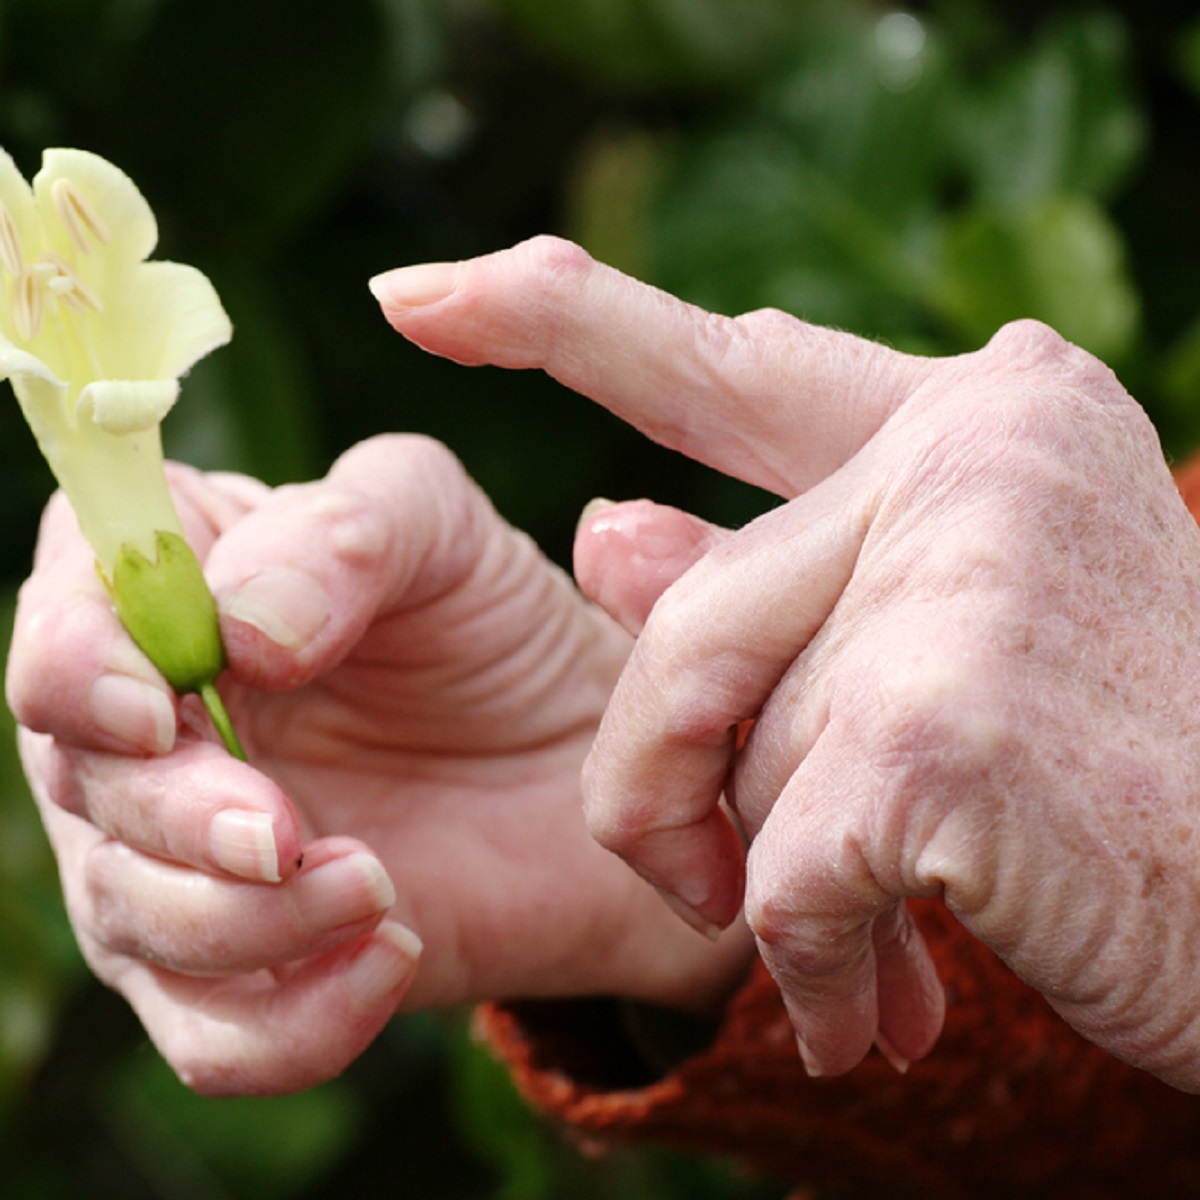 Retseptid artroosi raviks Zozhis